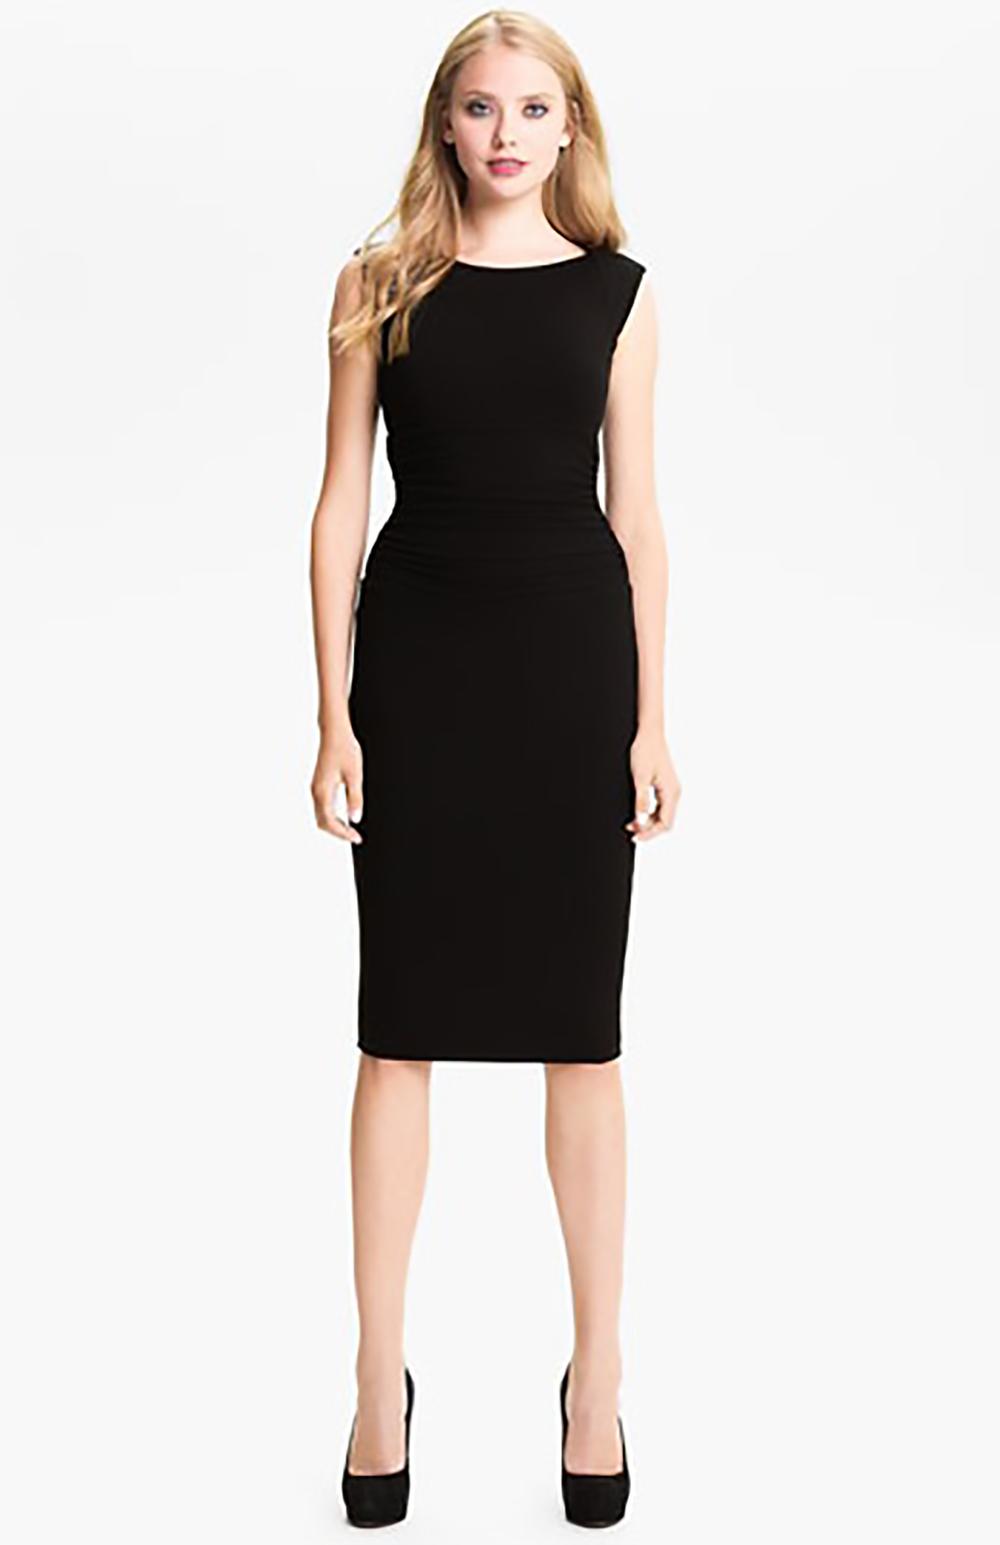 nordstrom B44 dressed by Bailey 44 ruched cap sleeve sheath dress sheath dress 1500.jpg